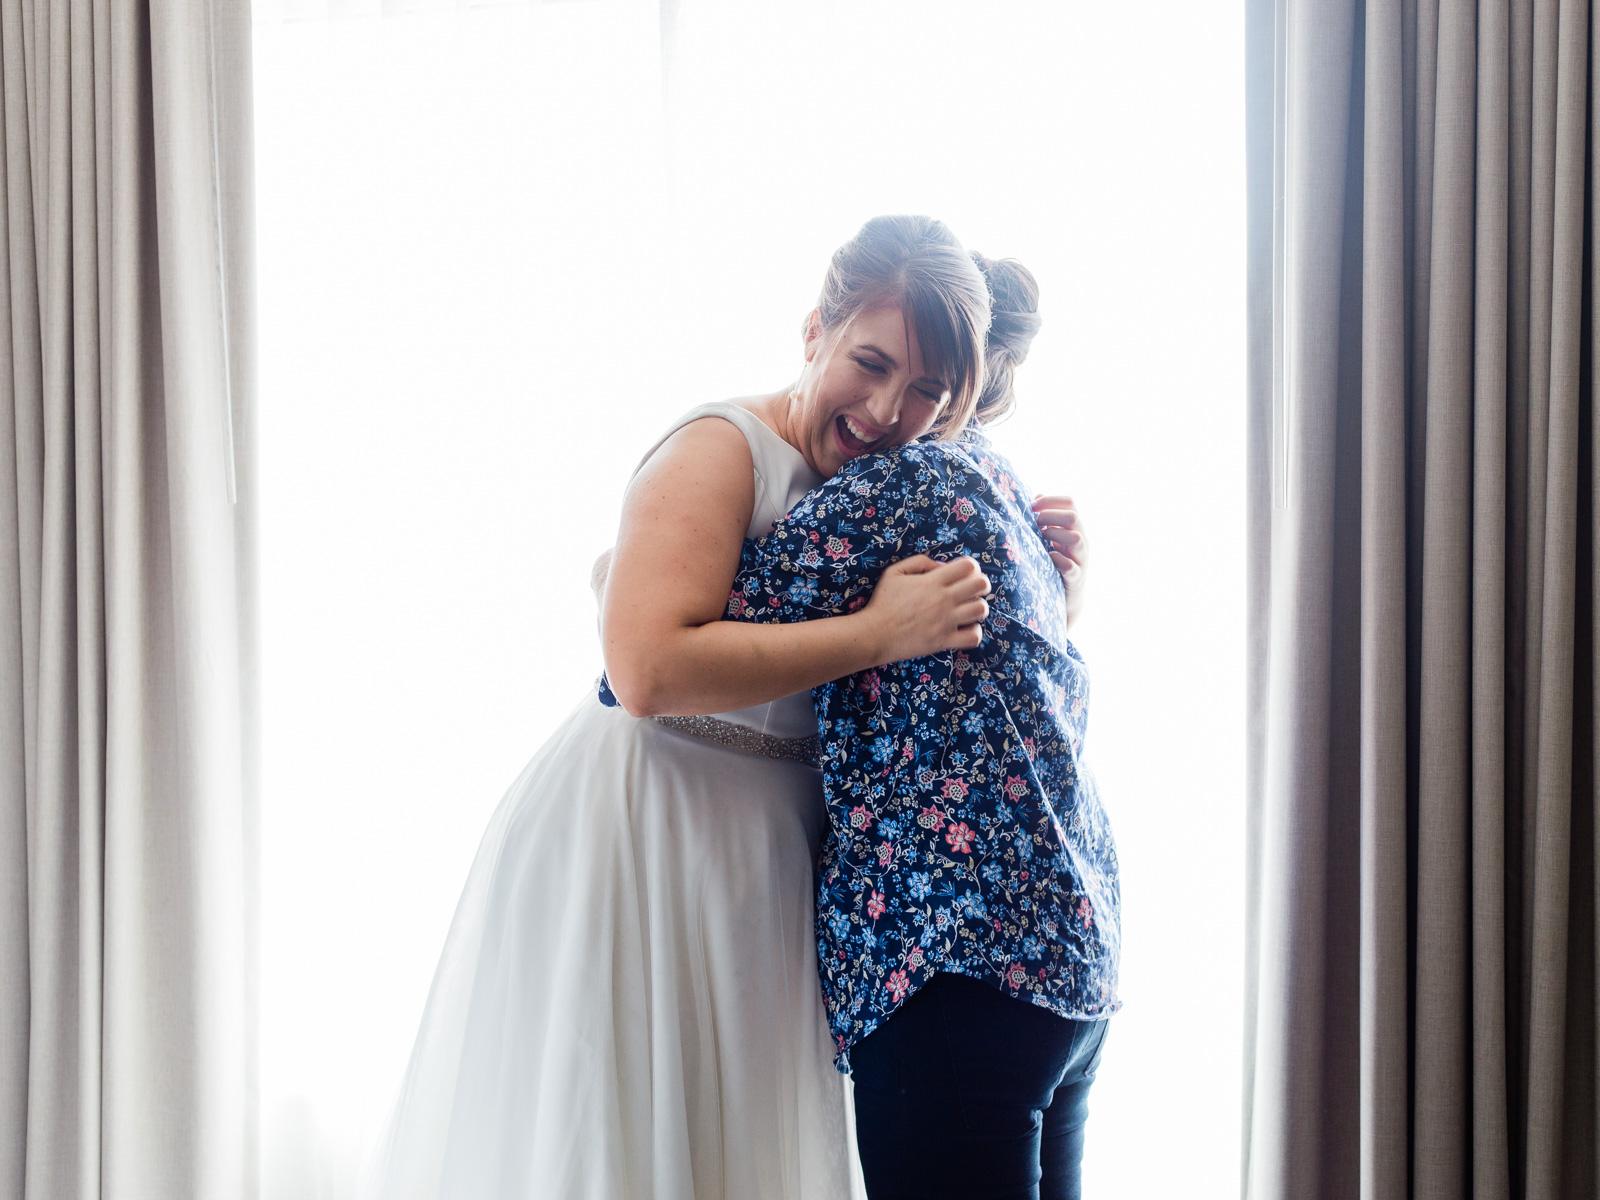 Bright and Joyful Cleveland Wedding Photography at Music Box Supper Club-8.jpg